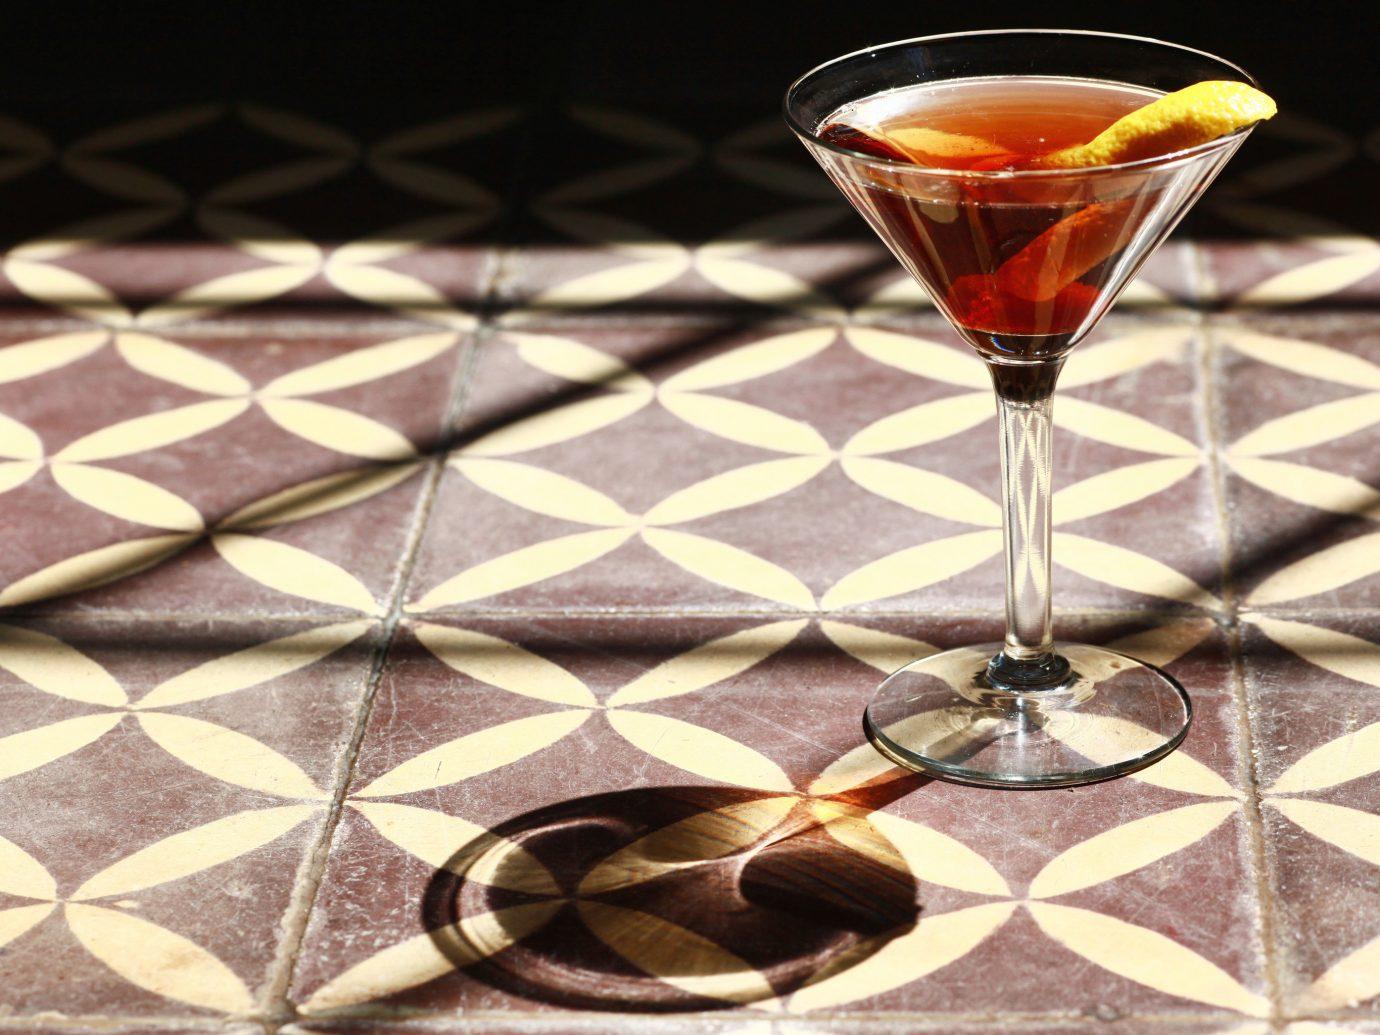 Offbeat indoor Drink alcoholic beverage cocktail martini glass beverage alcohol